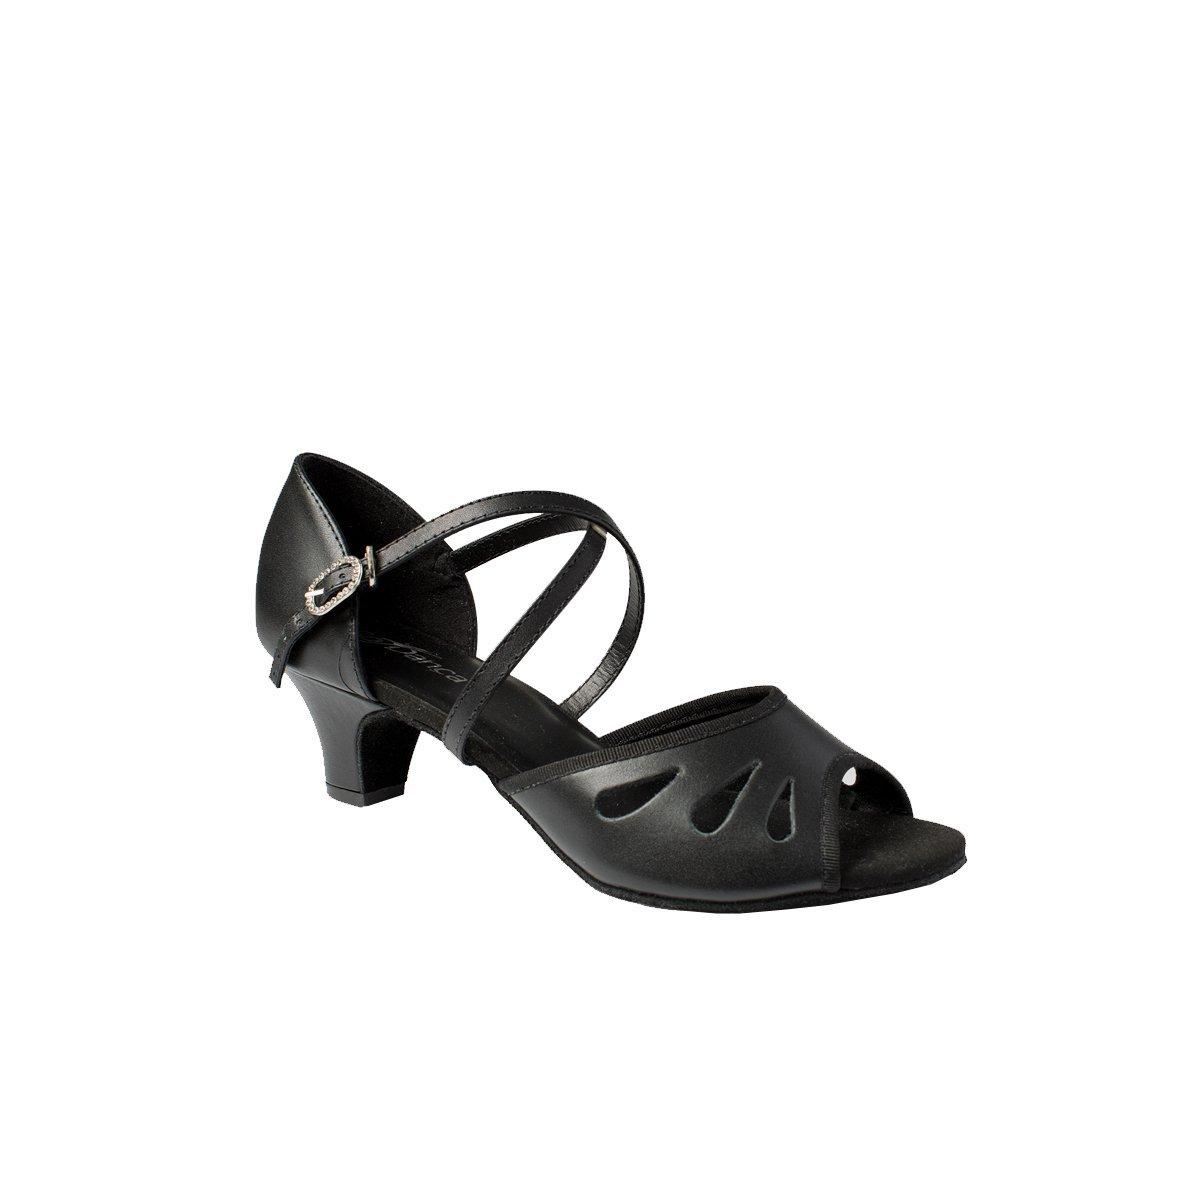 Sodanca Bl-182 Adult Radison Open Toe Ballroom Shoe